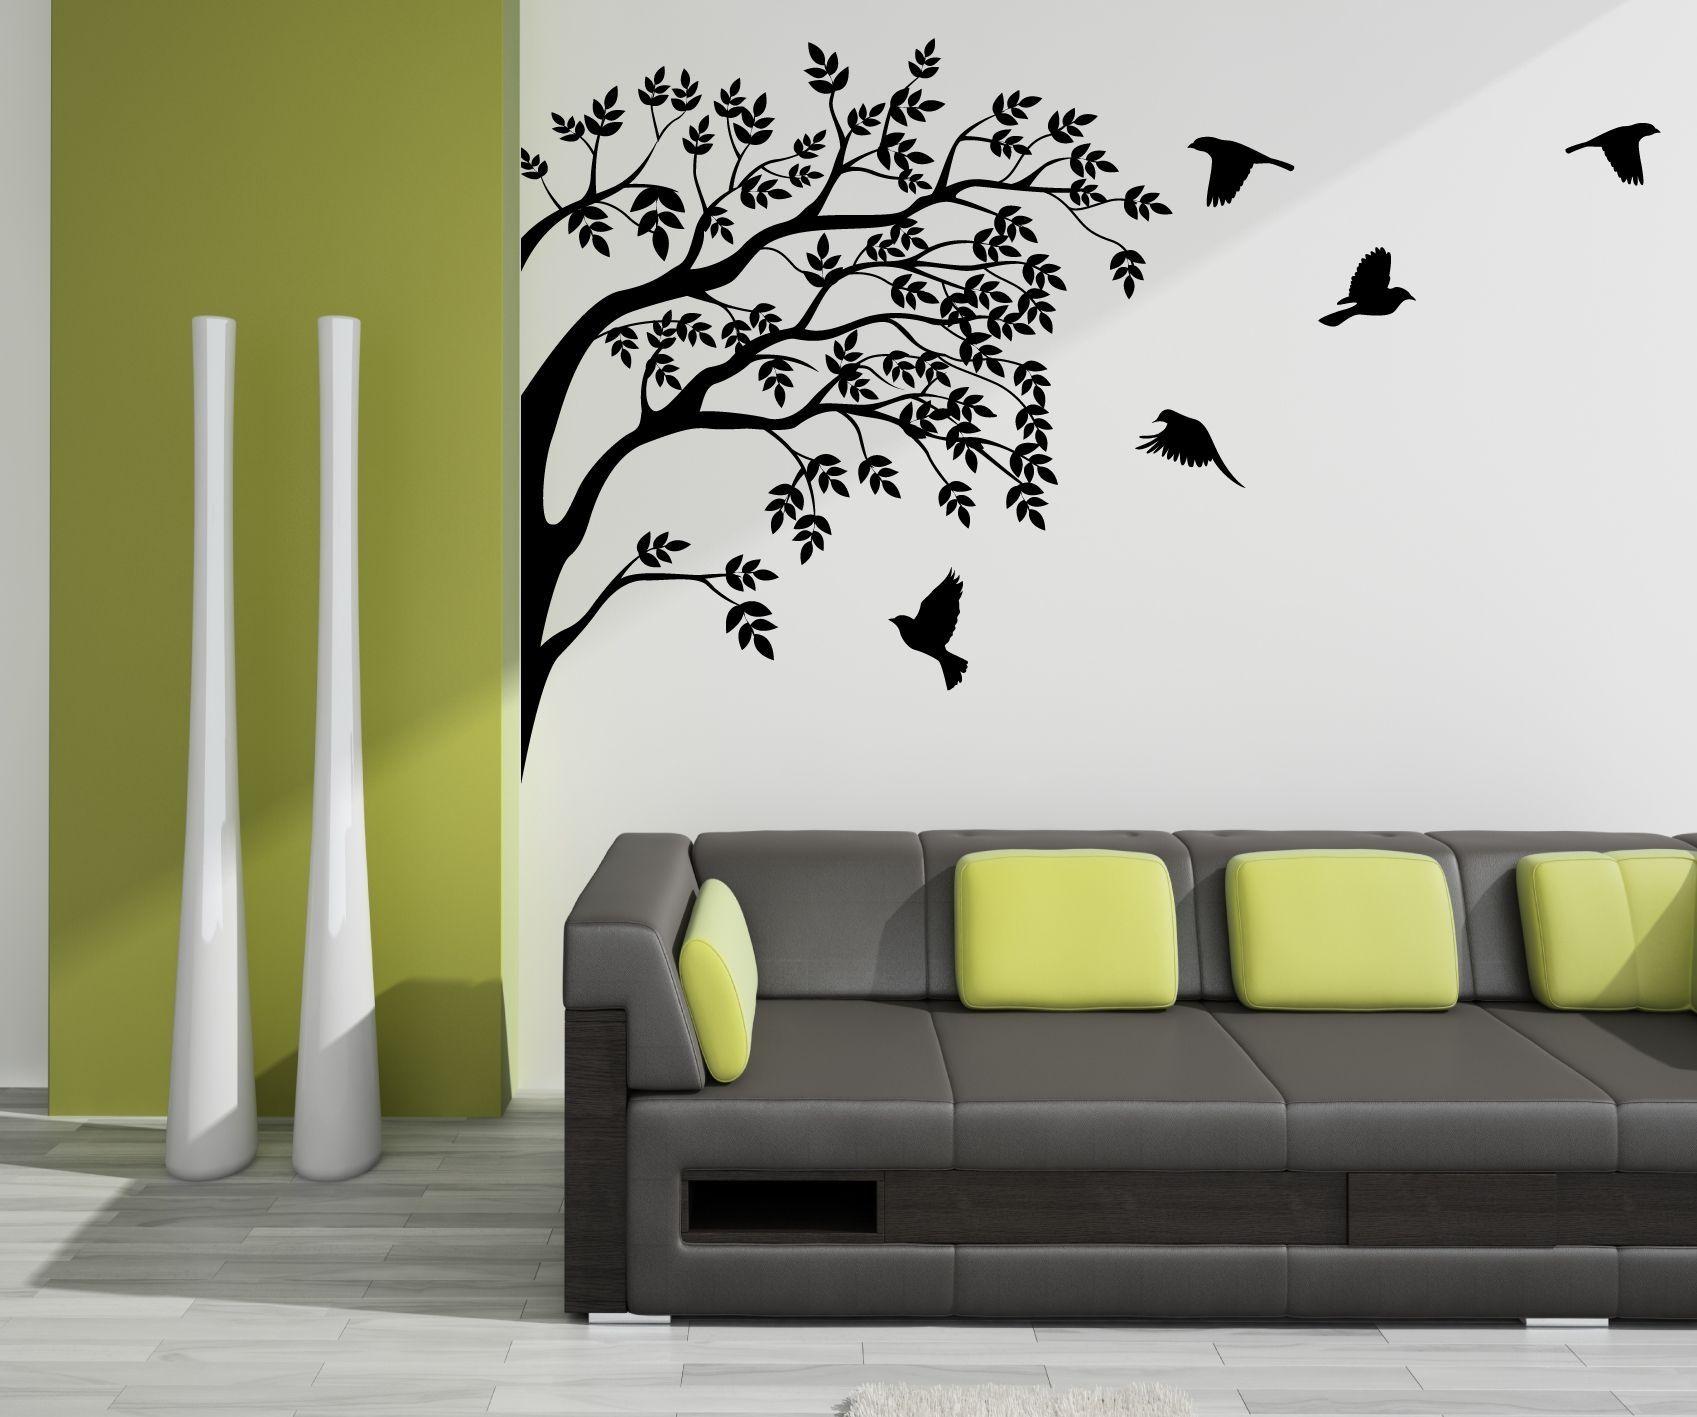 Vinyl wall decoration ideas umadepa pinterest wall